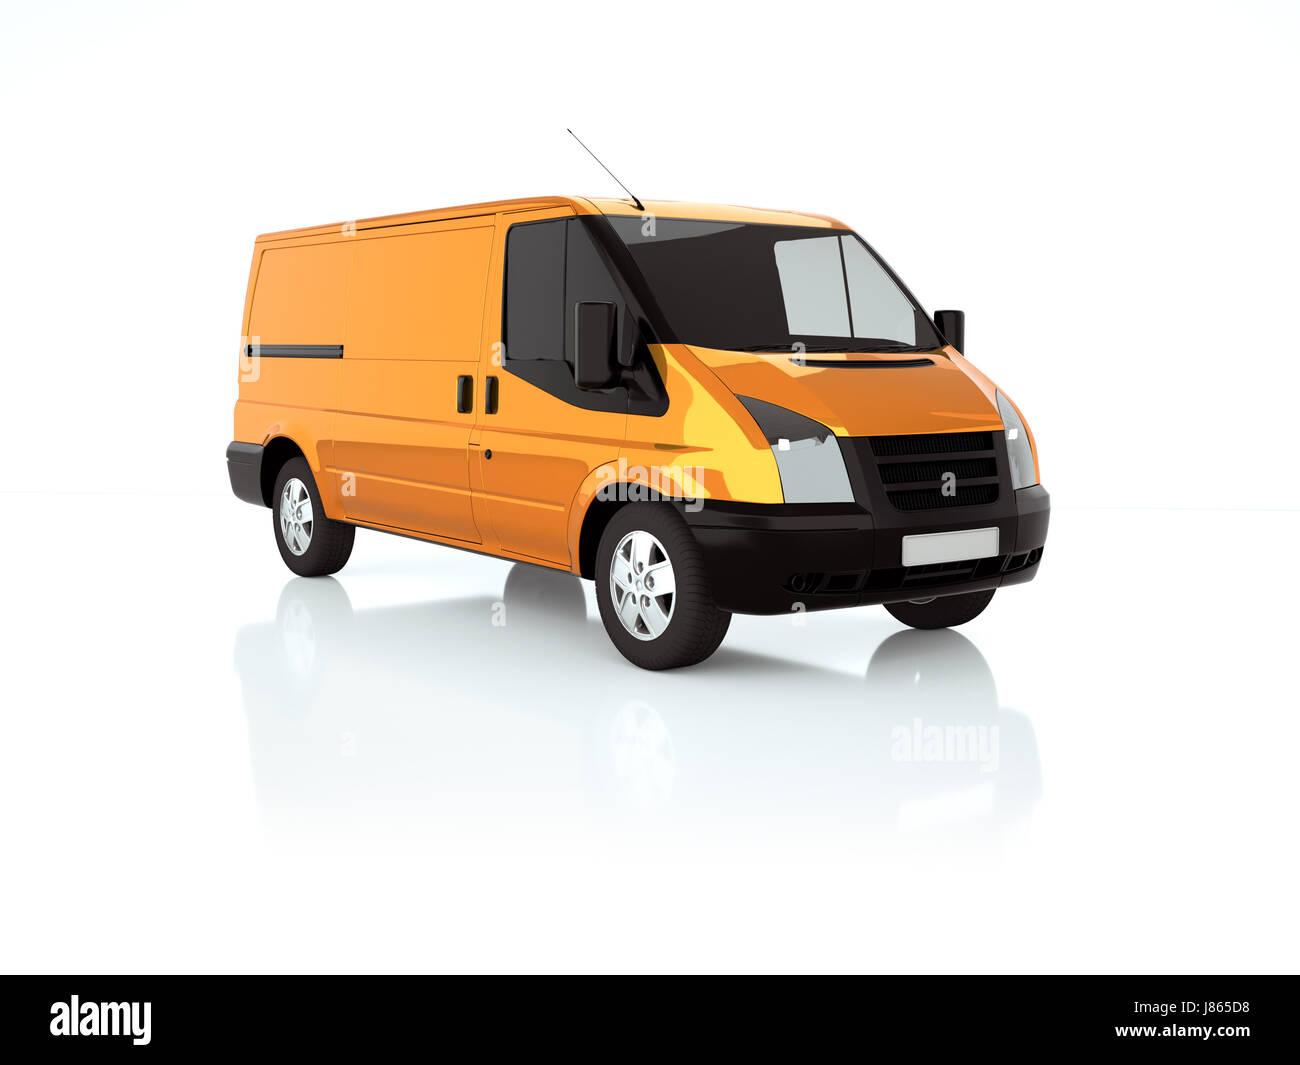 transport business dealings deal business transaction business bussiness work - Stock Image